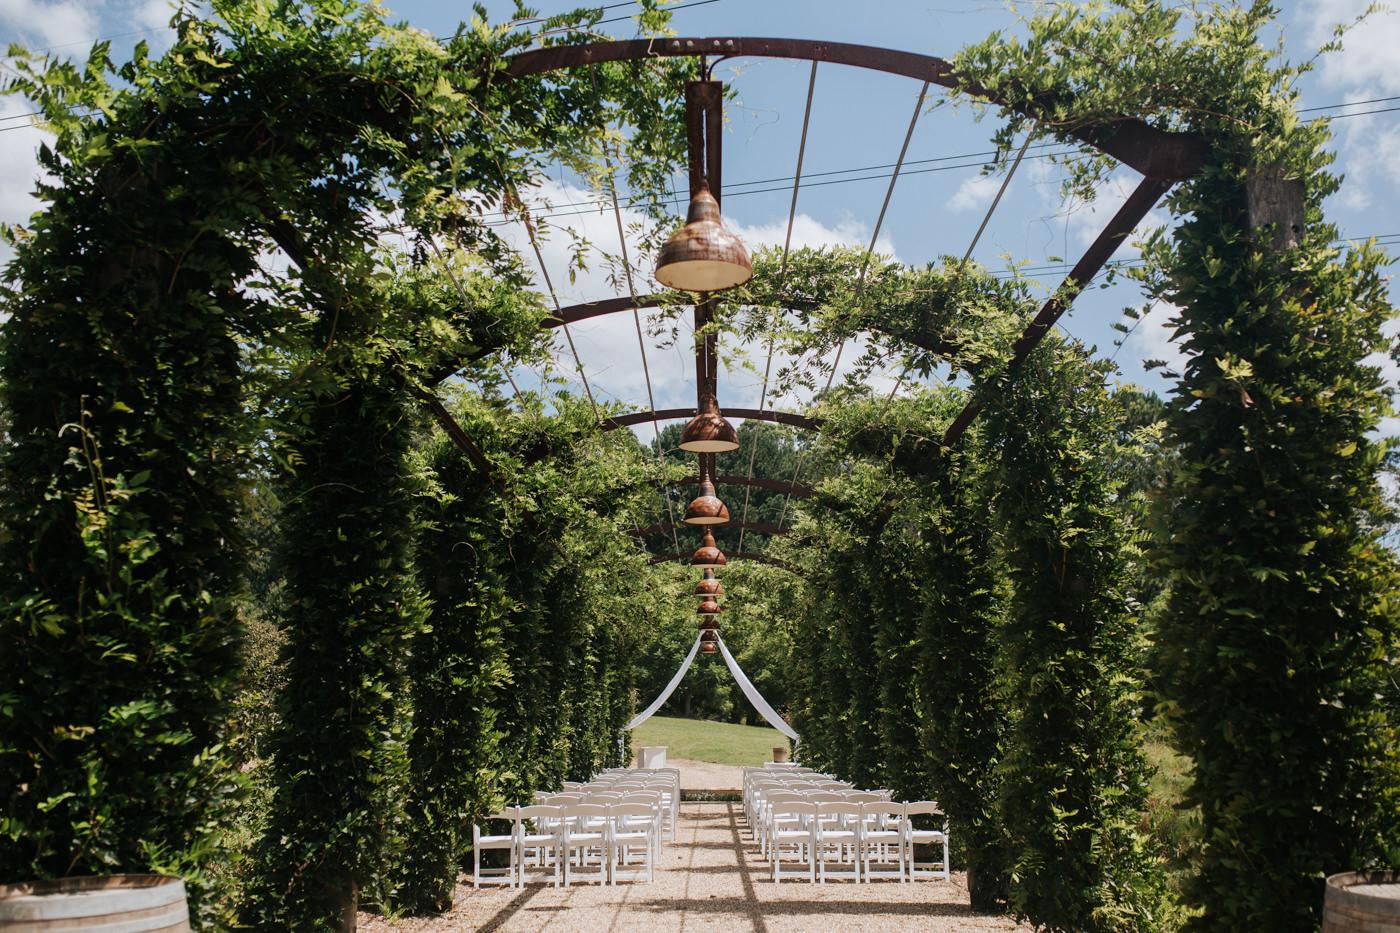 Nick & Vanezza - Fernbank Farm Wedding - Samantha Heather Photography-1.jpg